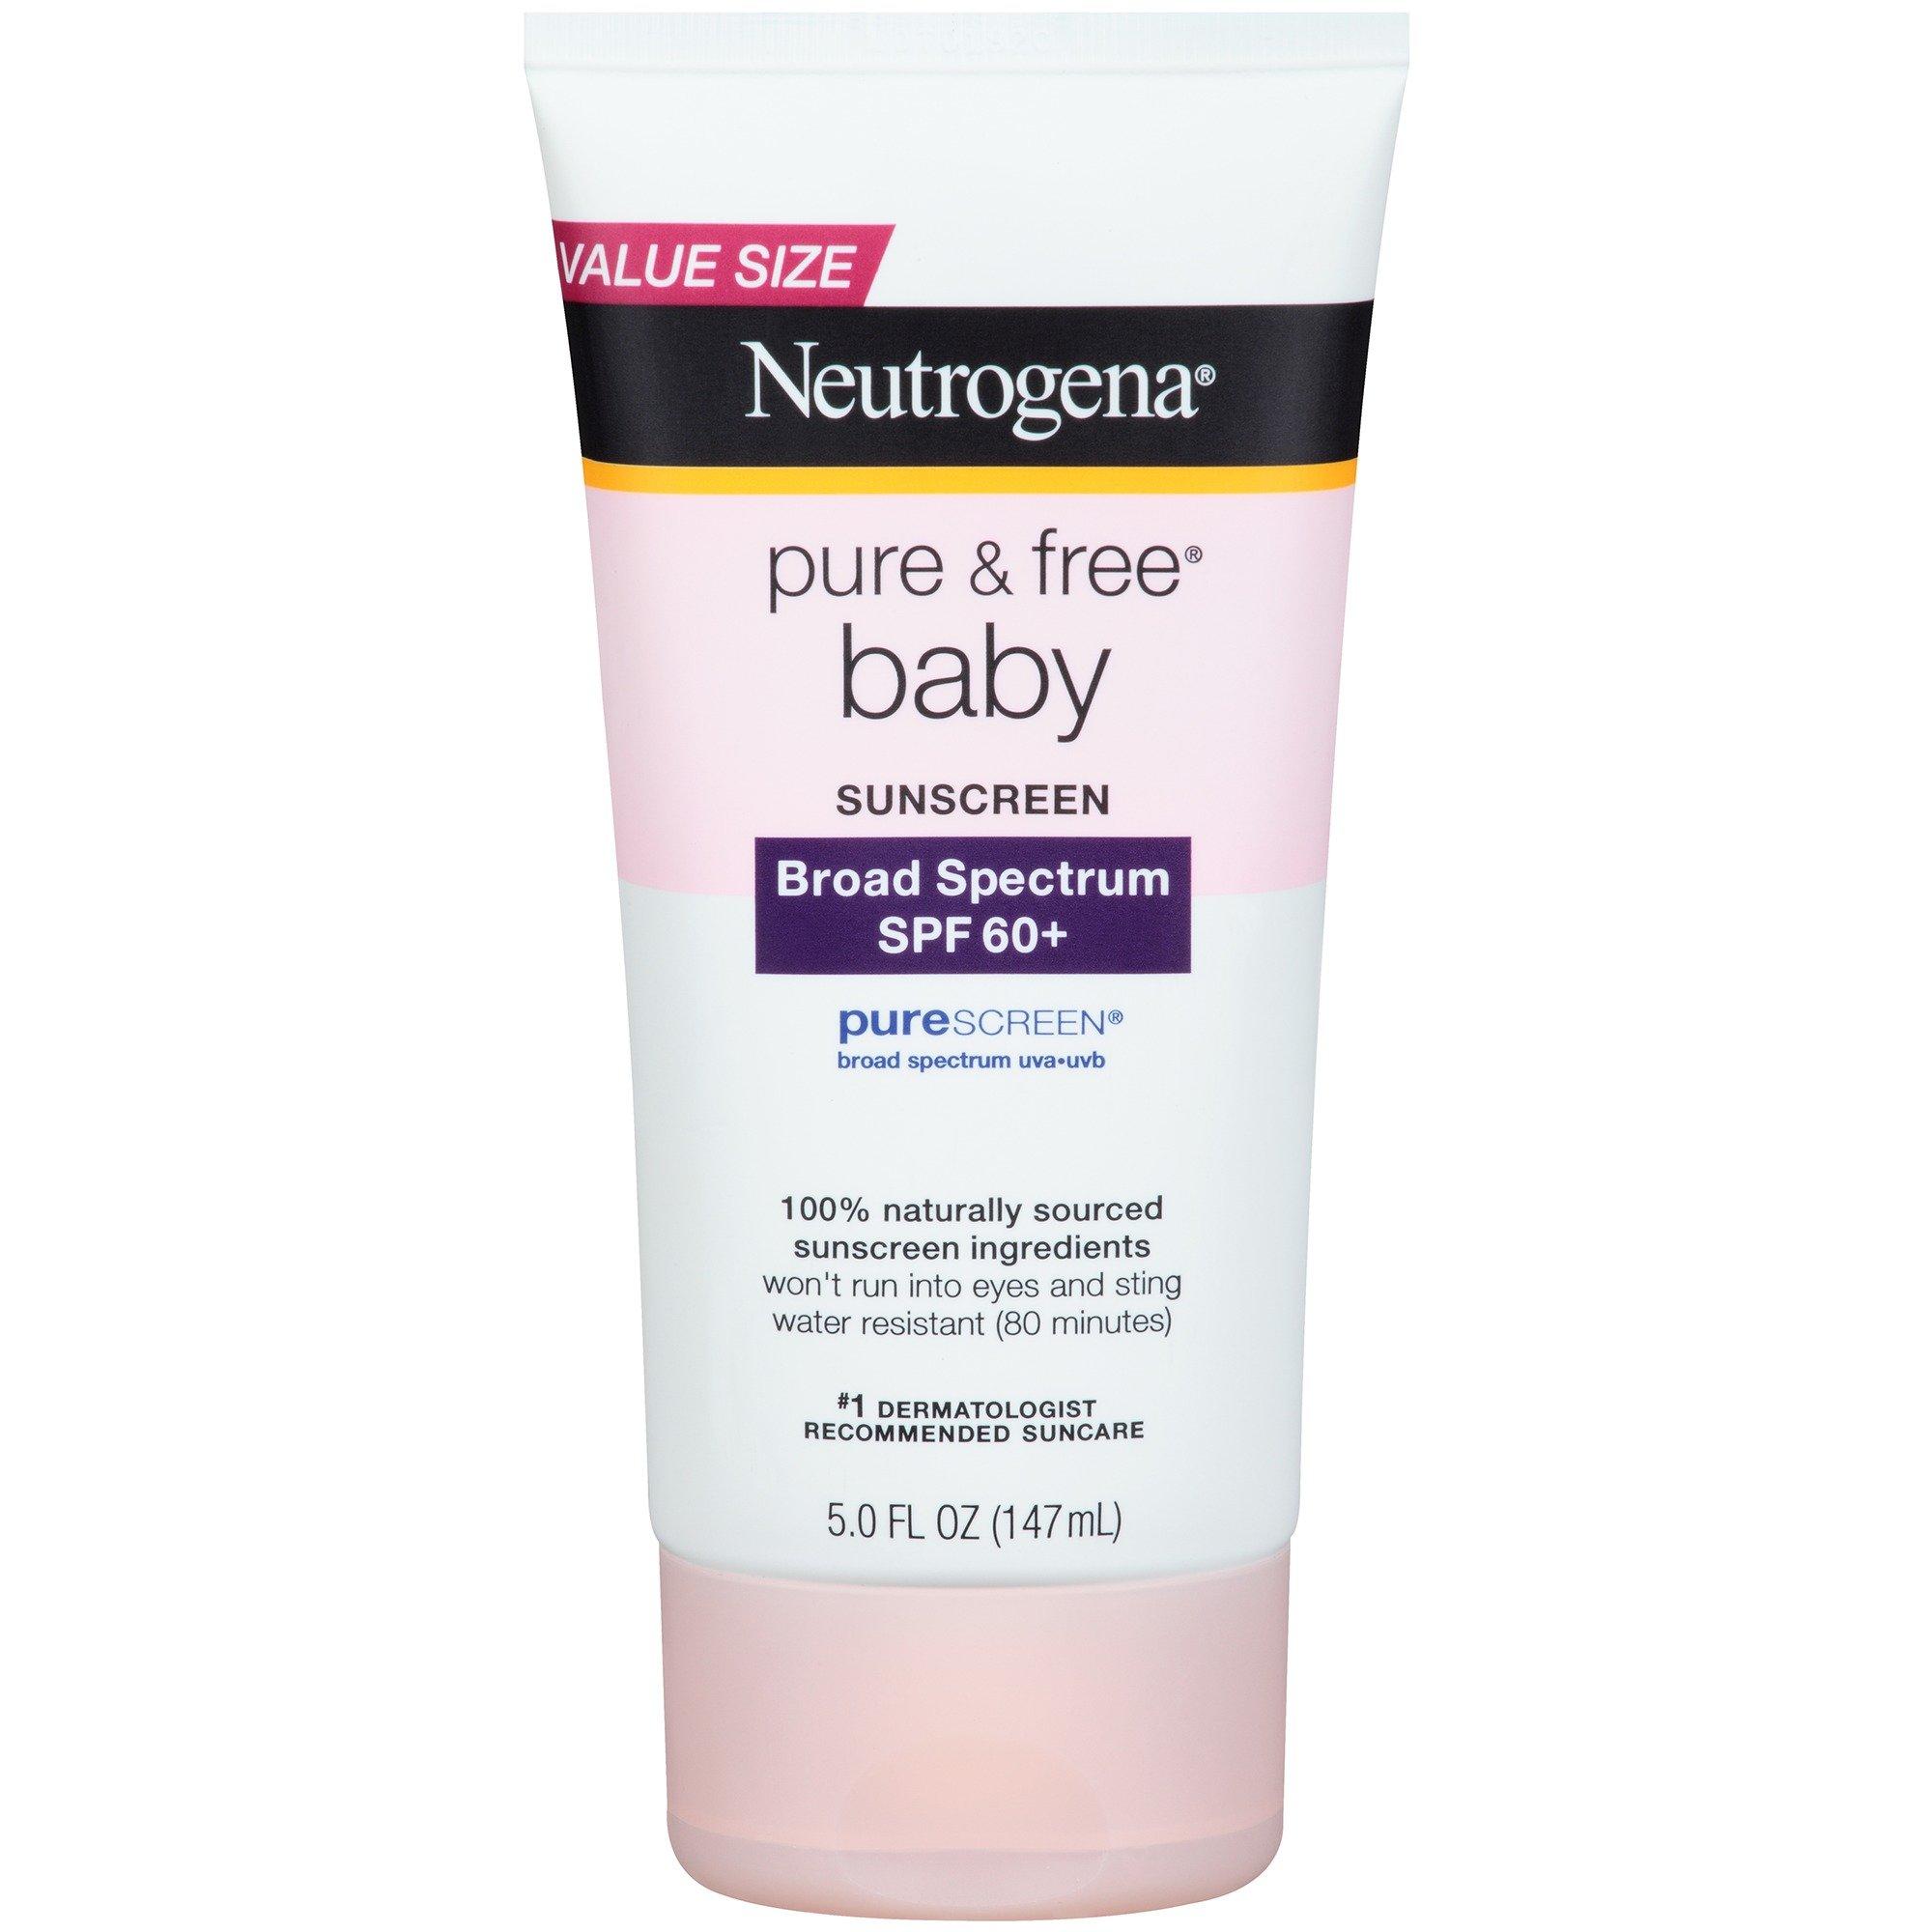 Neutrogena Pure & Free Baby Sunscreen Lotion Broad Spectrum SPF 60+, 5 Fl. Oz by Neutrogena (Image #1)